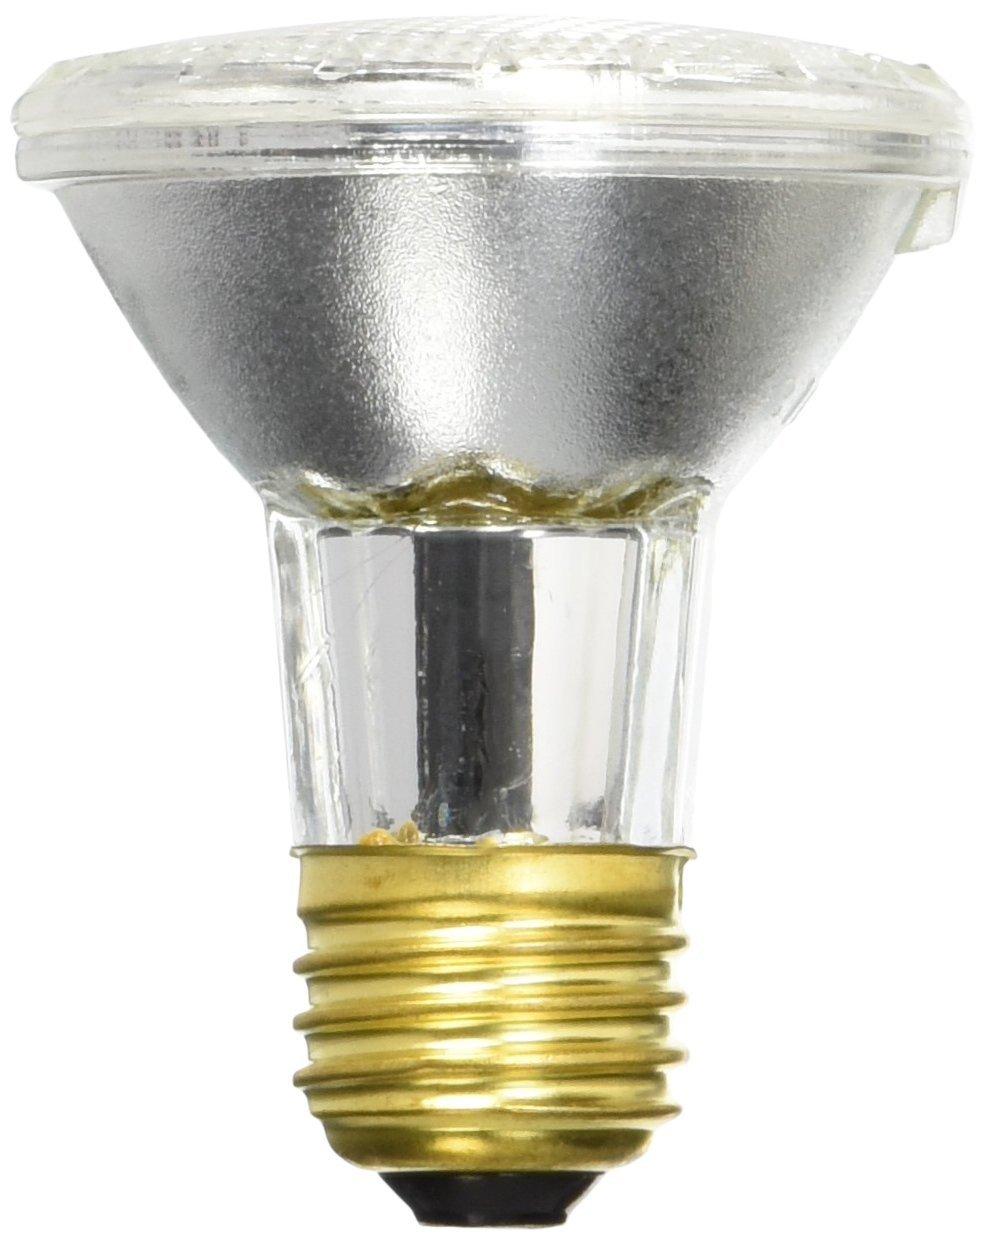 GE Lighting 69163 38-watt 490-Lumen Energy-Efficient Halogen Floodlight Bulb with Medium Base (6 Pack)